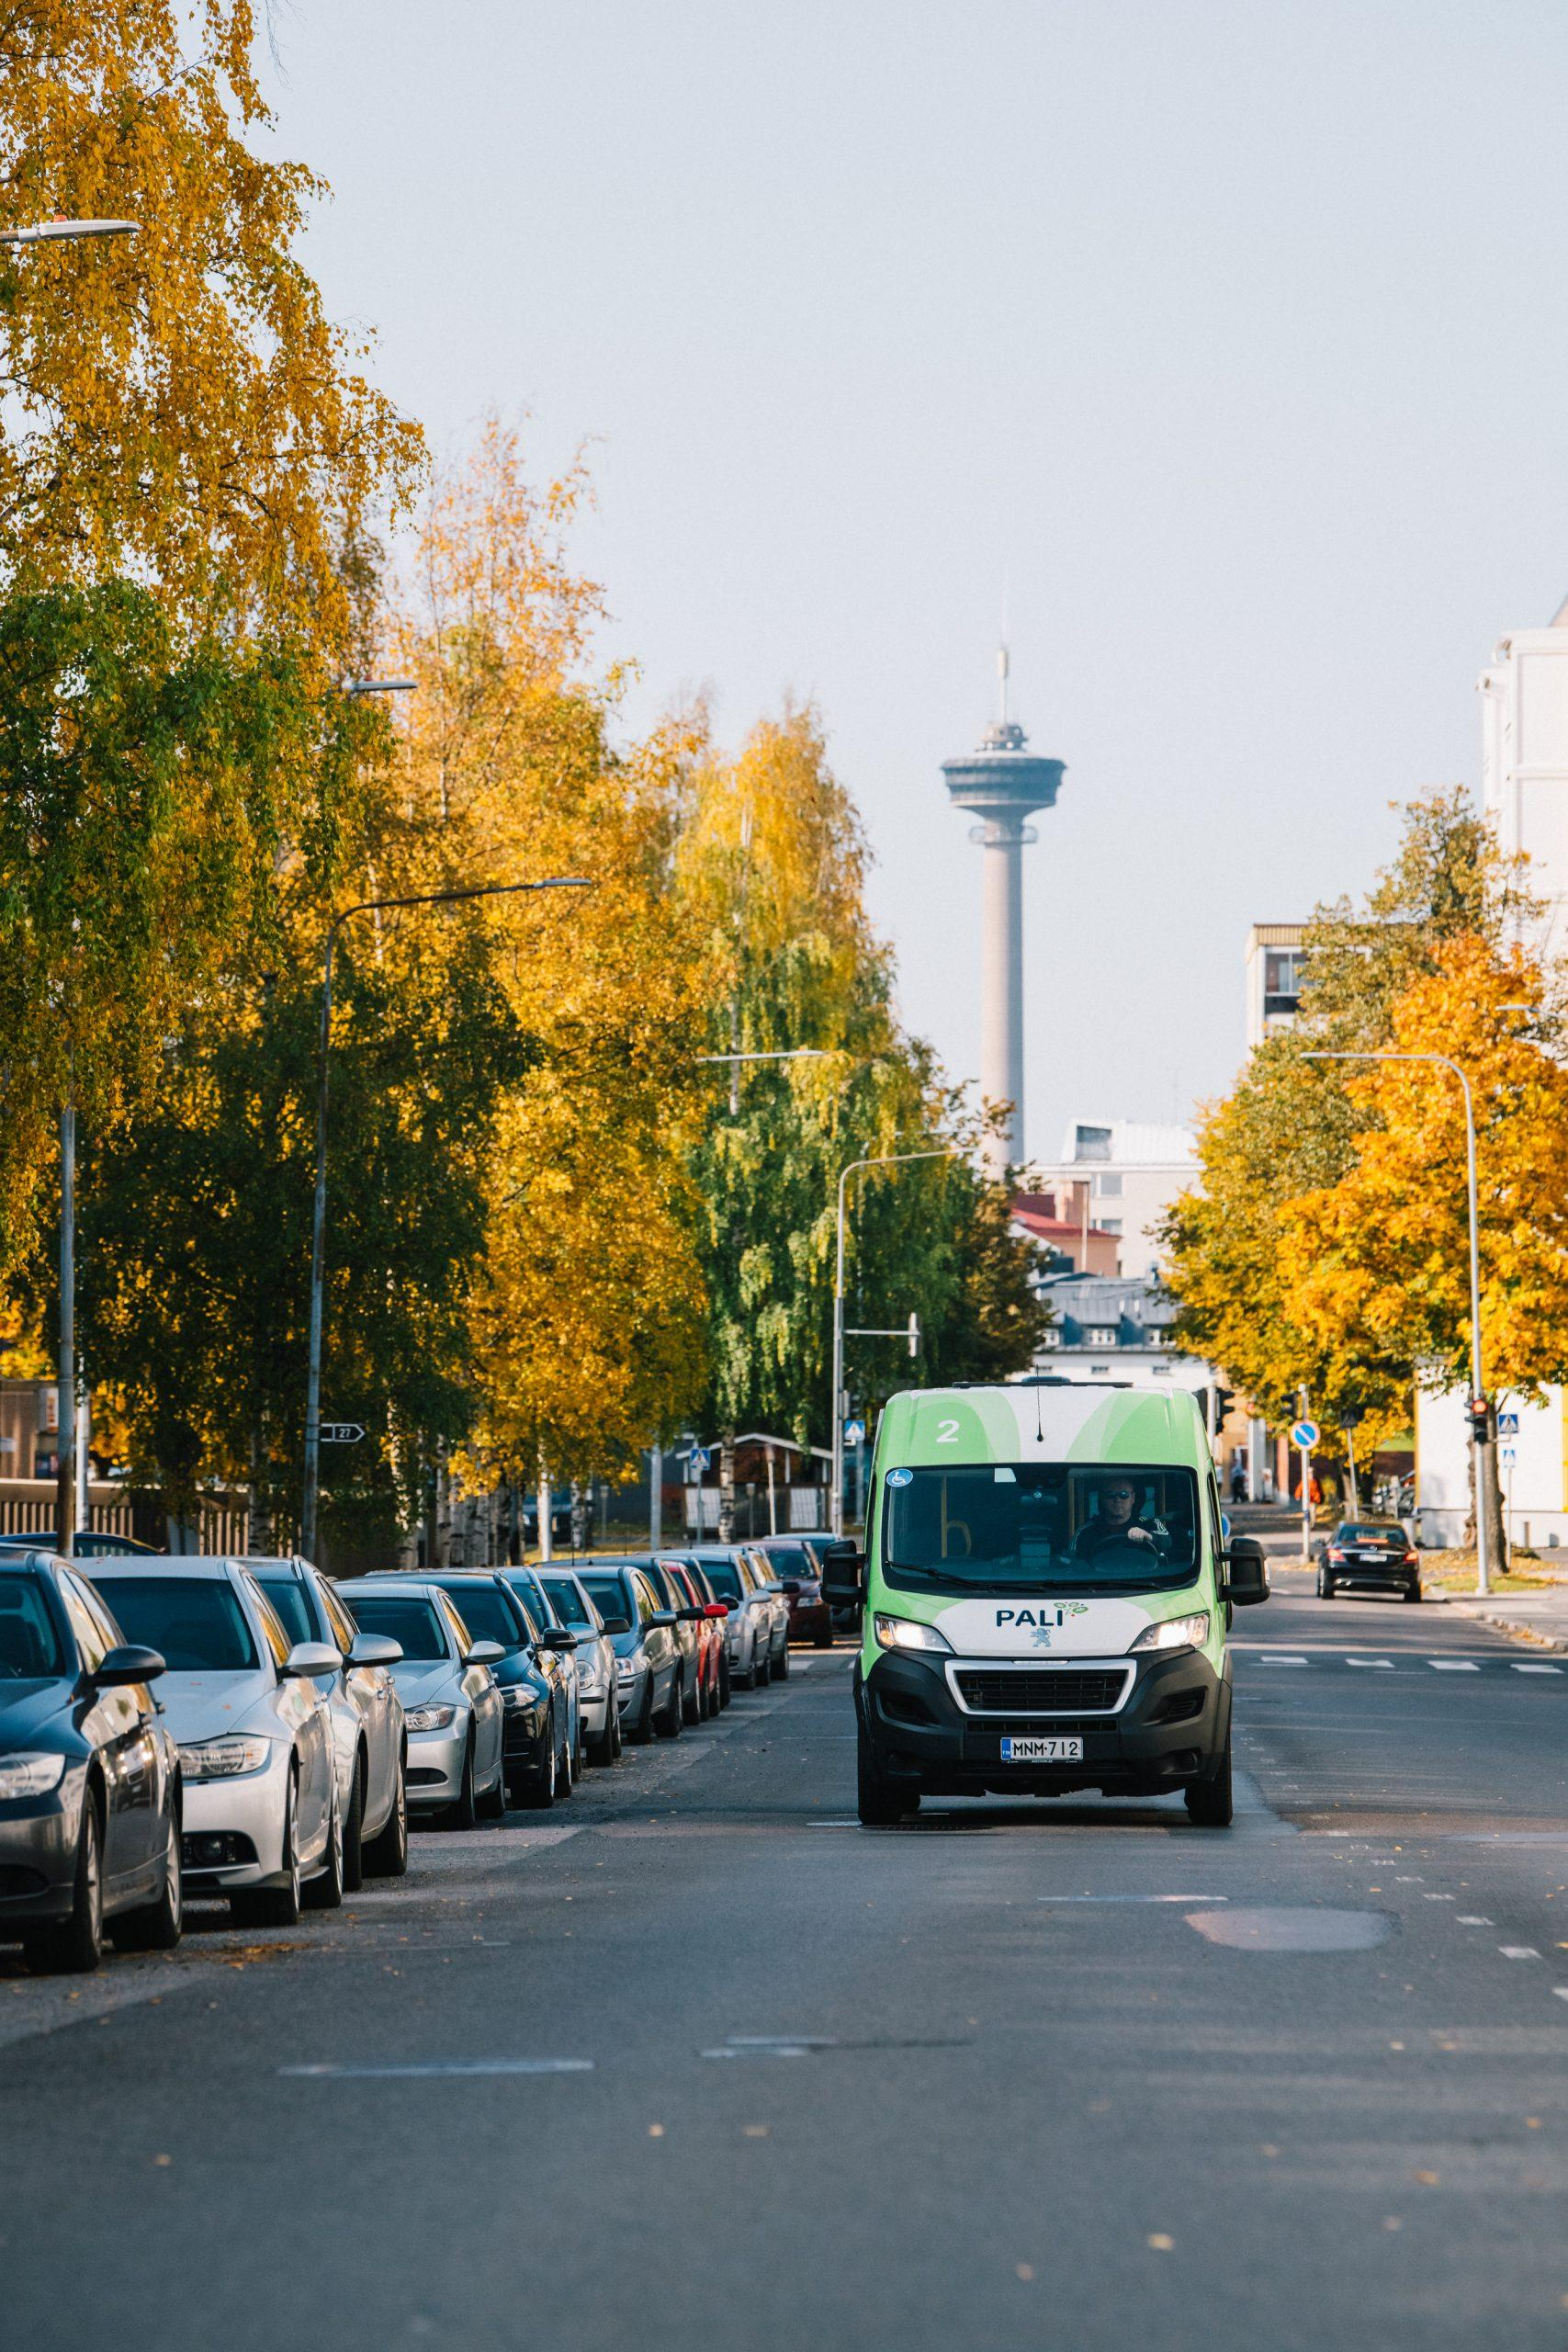 Palveluliikenteen bussi.